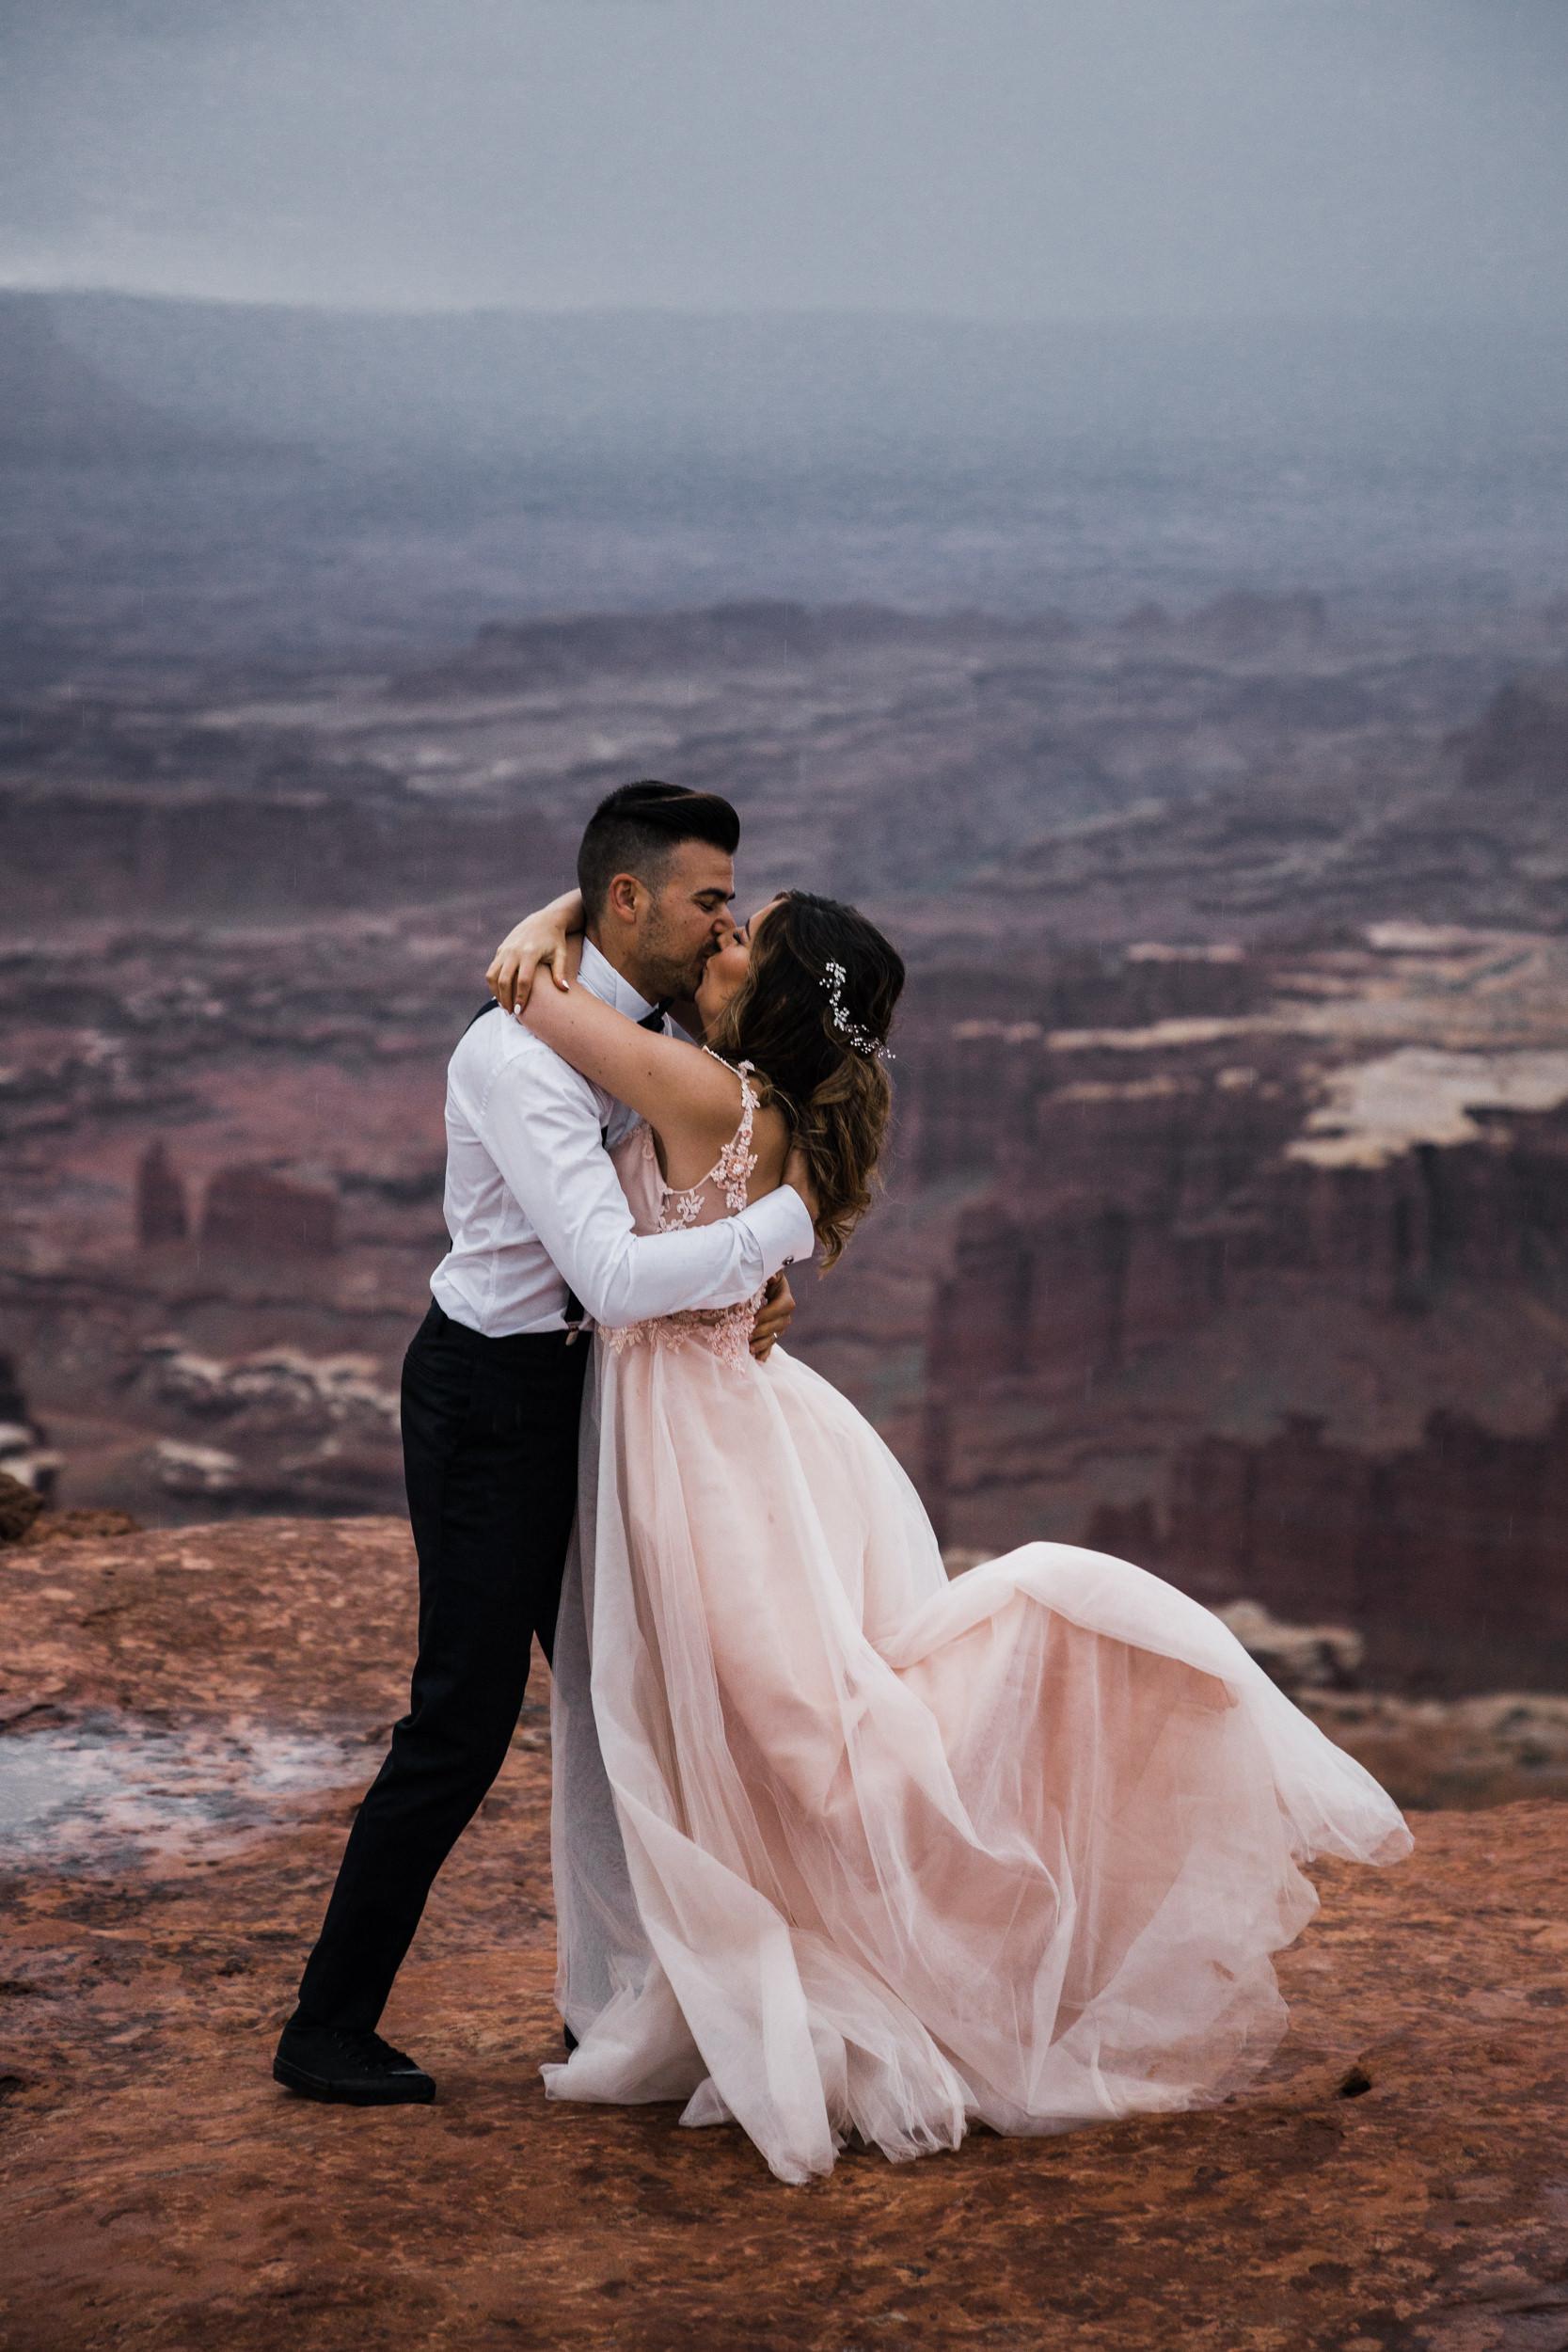 Hearnes-Elopement-Photography-Canyonlands-National-Park-Moab-Wedding-32.jpg